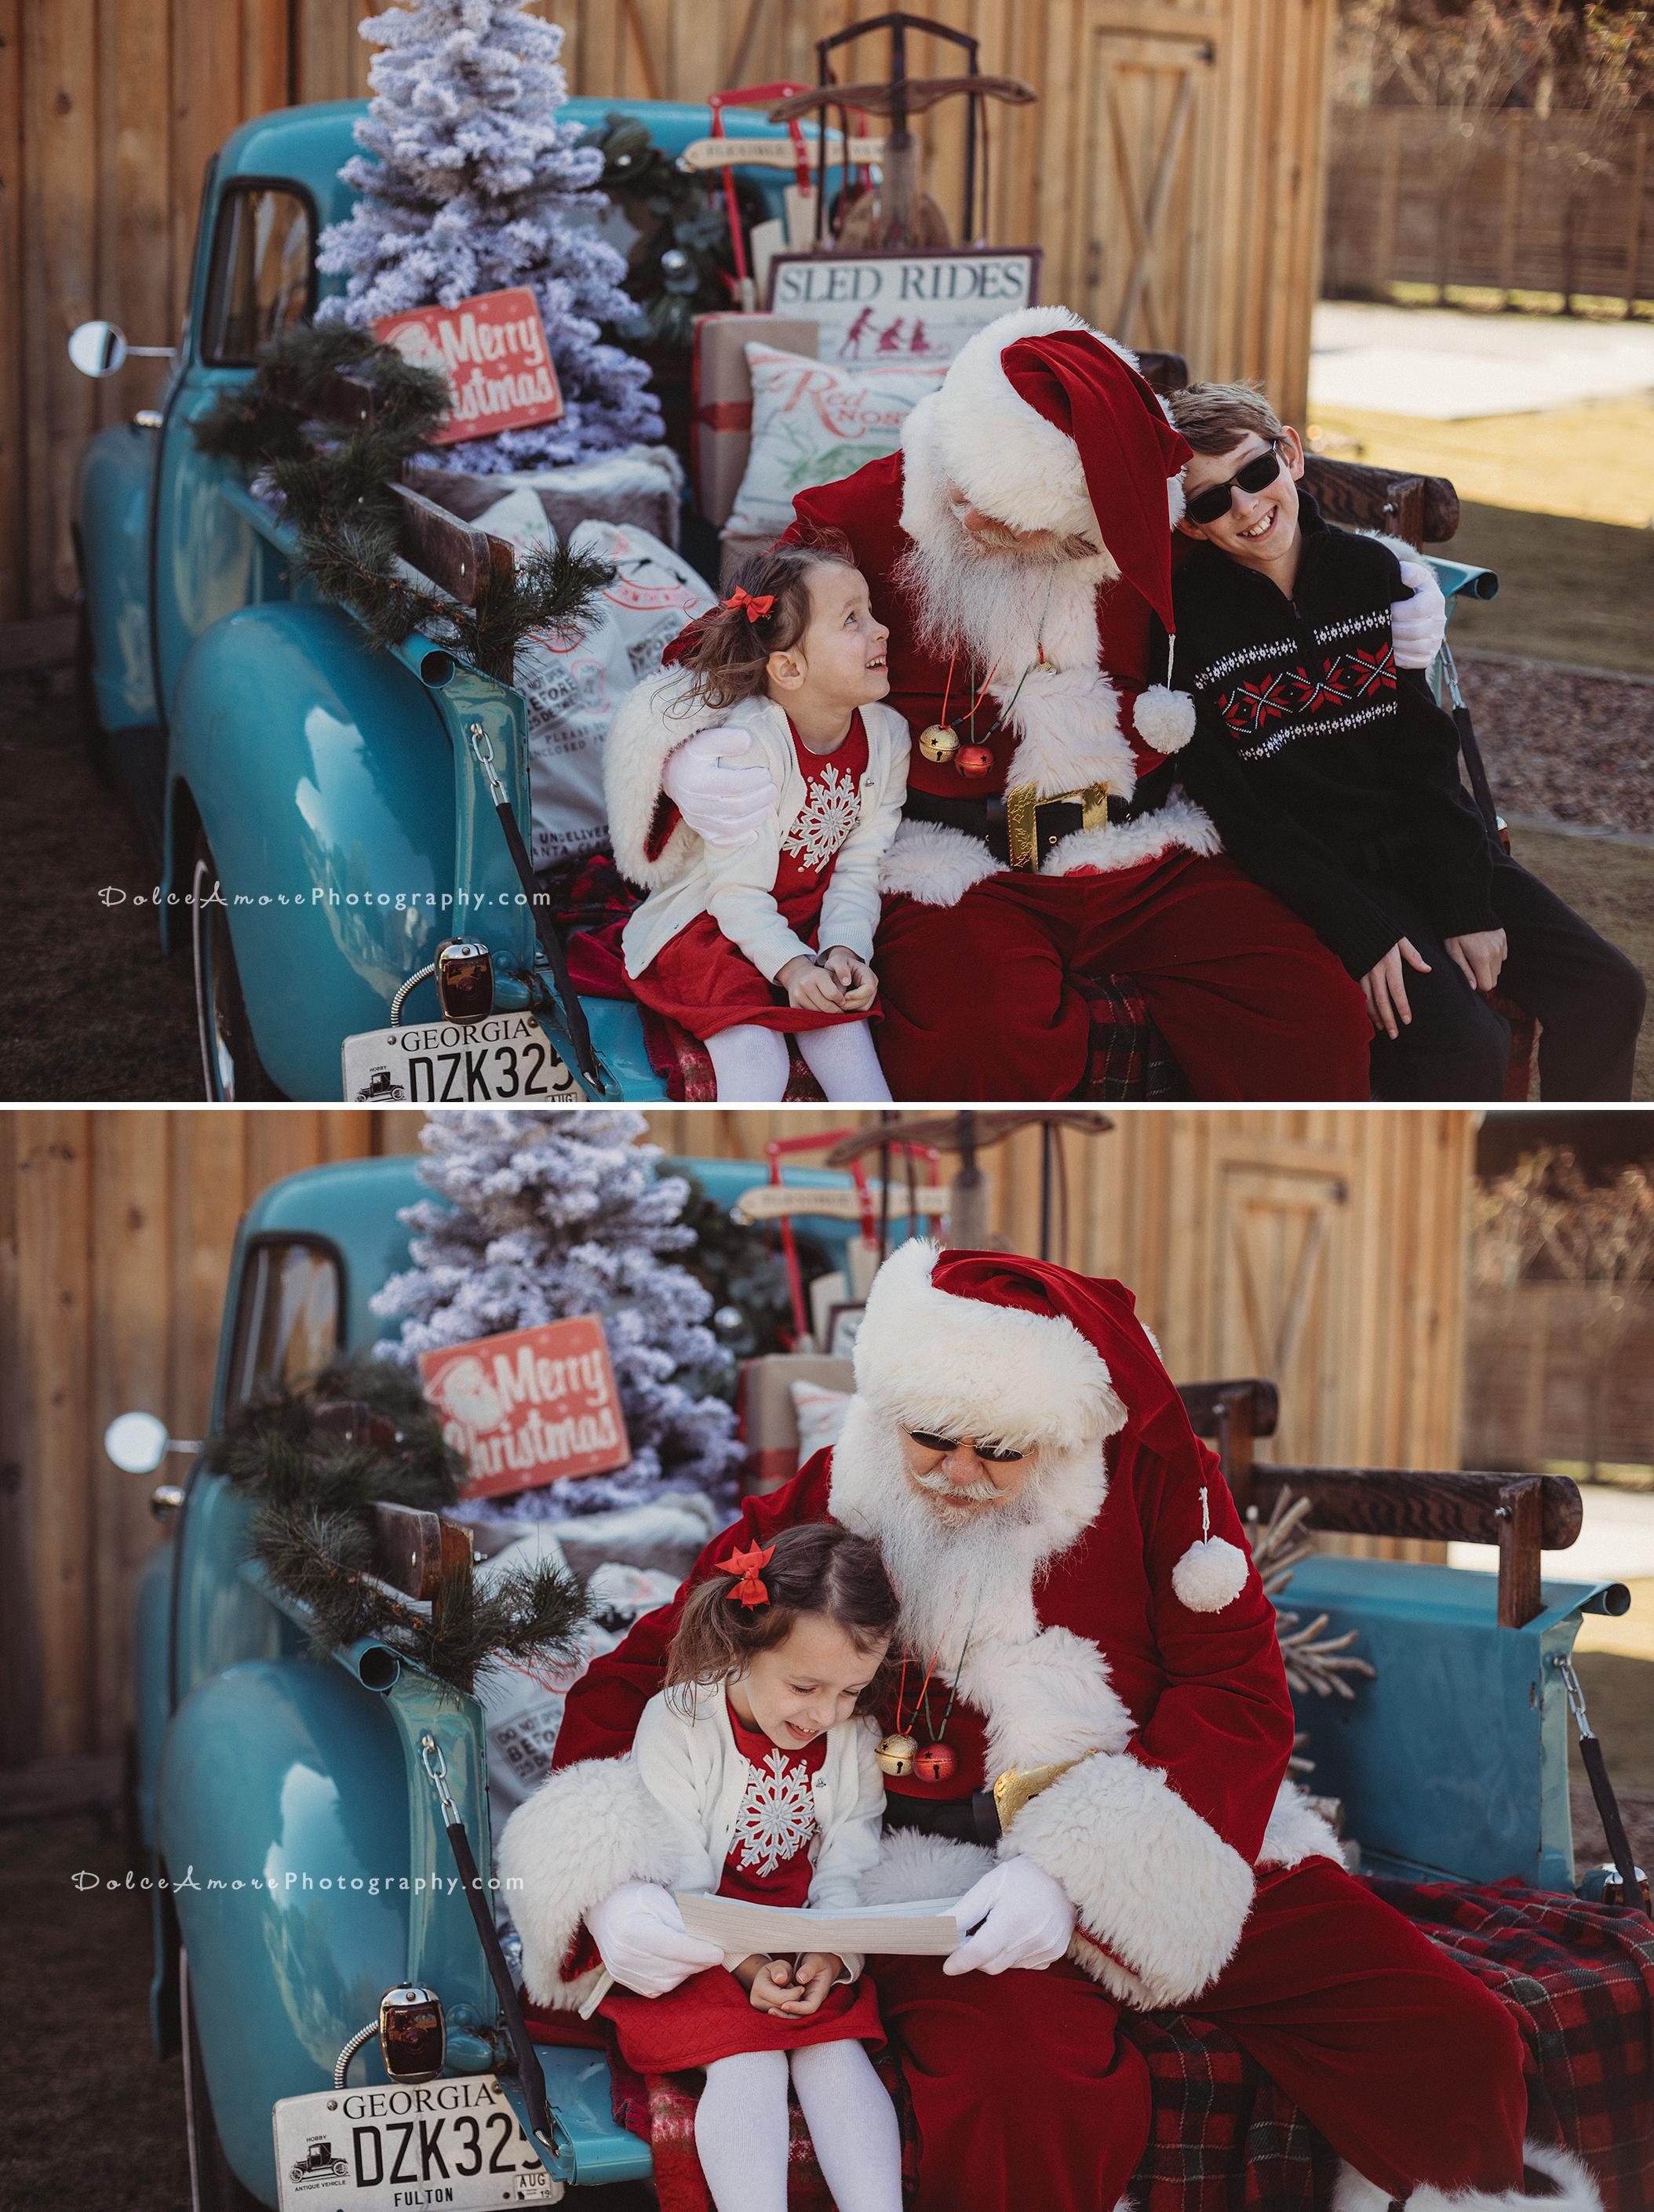 Christmas For Children In Marietta Ga 2020 Santa Minis | Alpharetta, GA | Dolce Amore Photography |Family